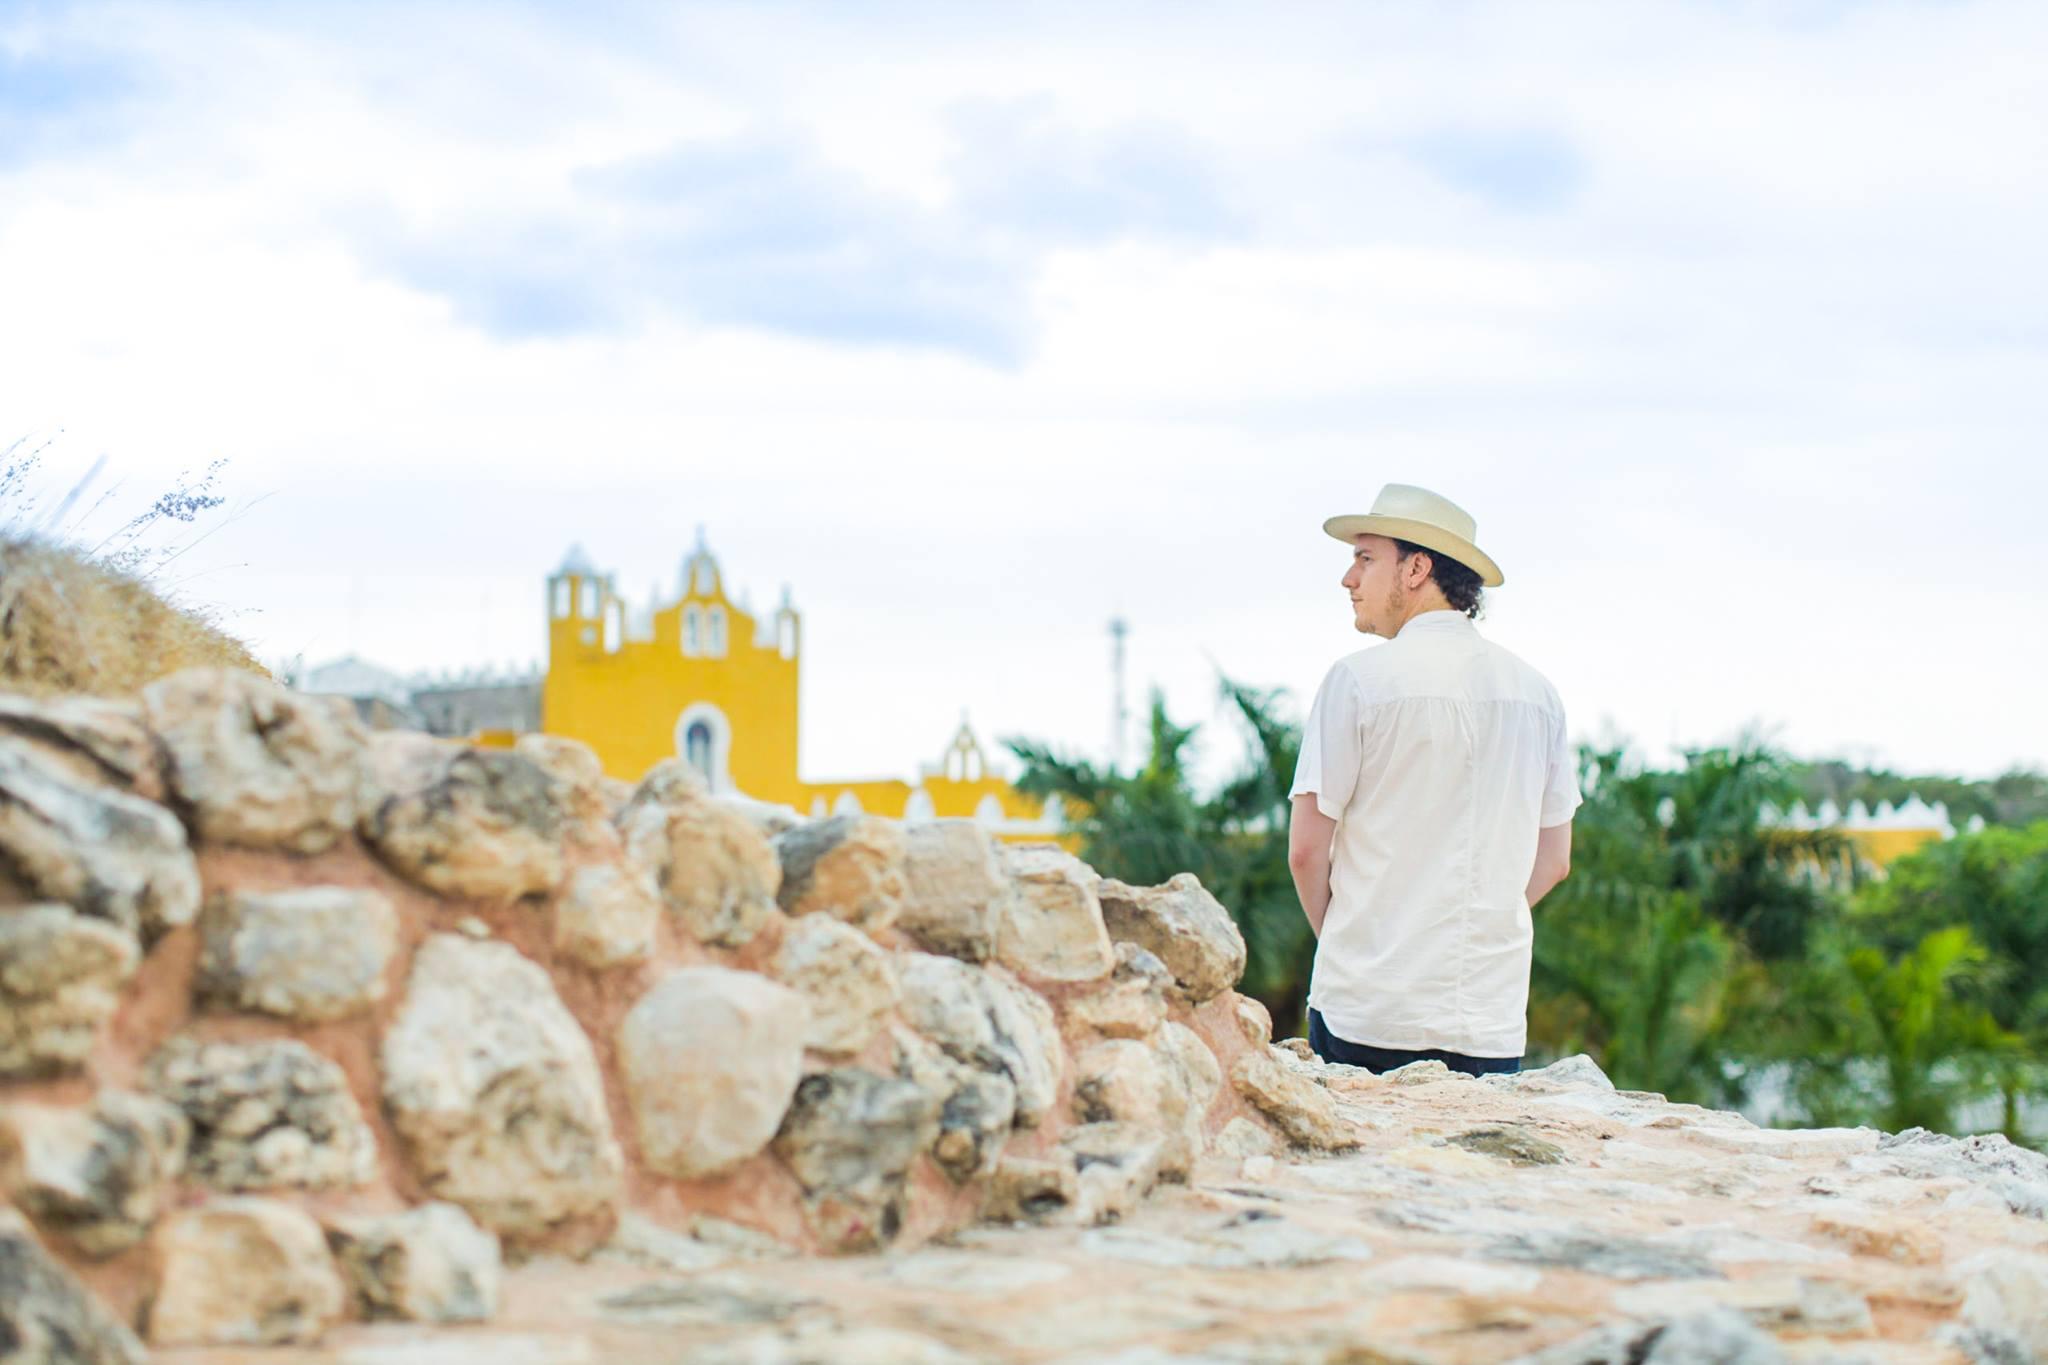 viajes-viajar-mexico-programa-television-documental-discovery